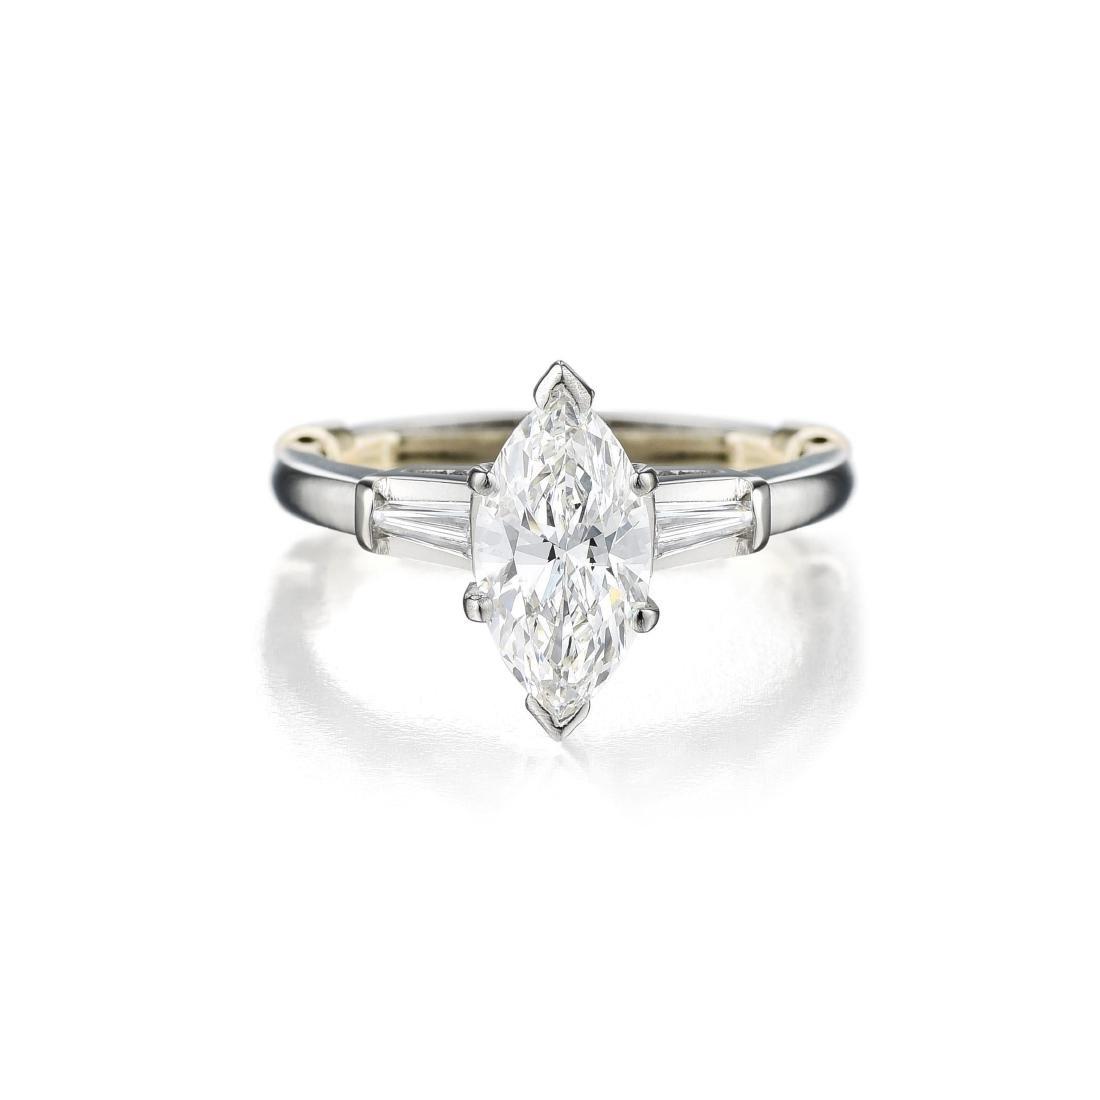 A 1.05-Carat Marquise-Cut Diamond Platinum Ring